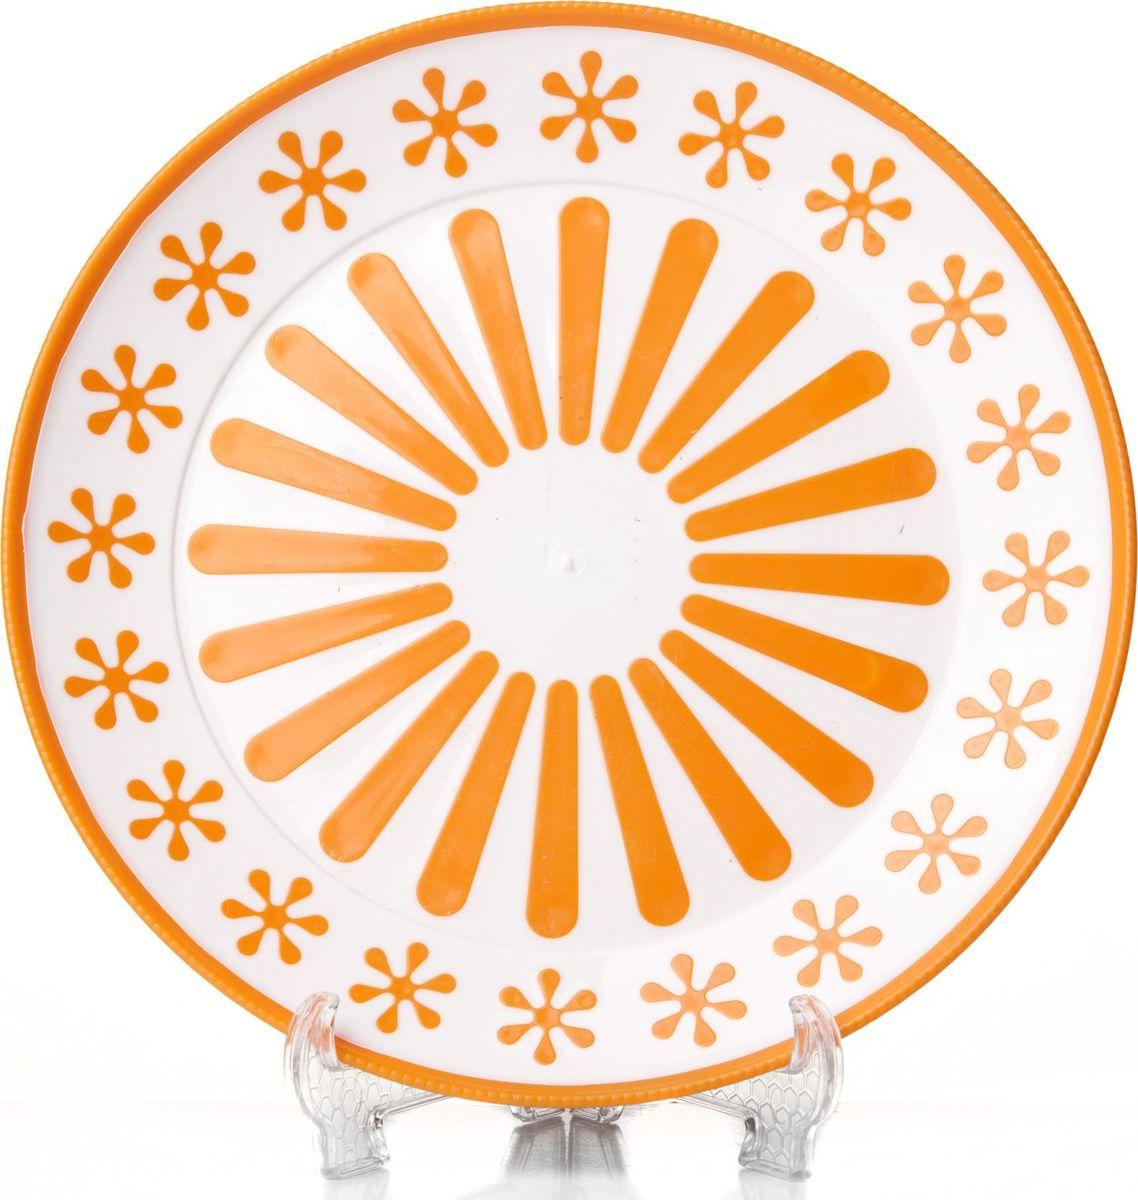 Тарелка Альтернатива Валенсия, цвет: оранжевый, белый, диаметр 19 см тарелка 19 см elff decor цвет белый синий